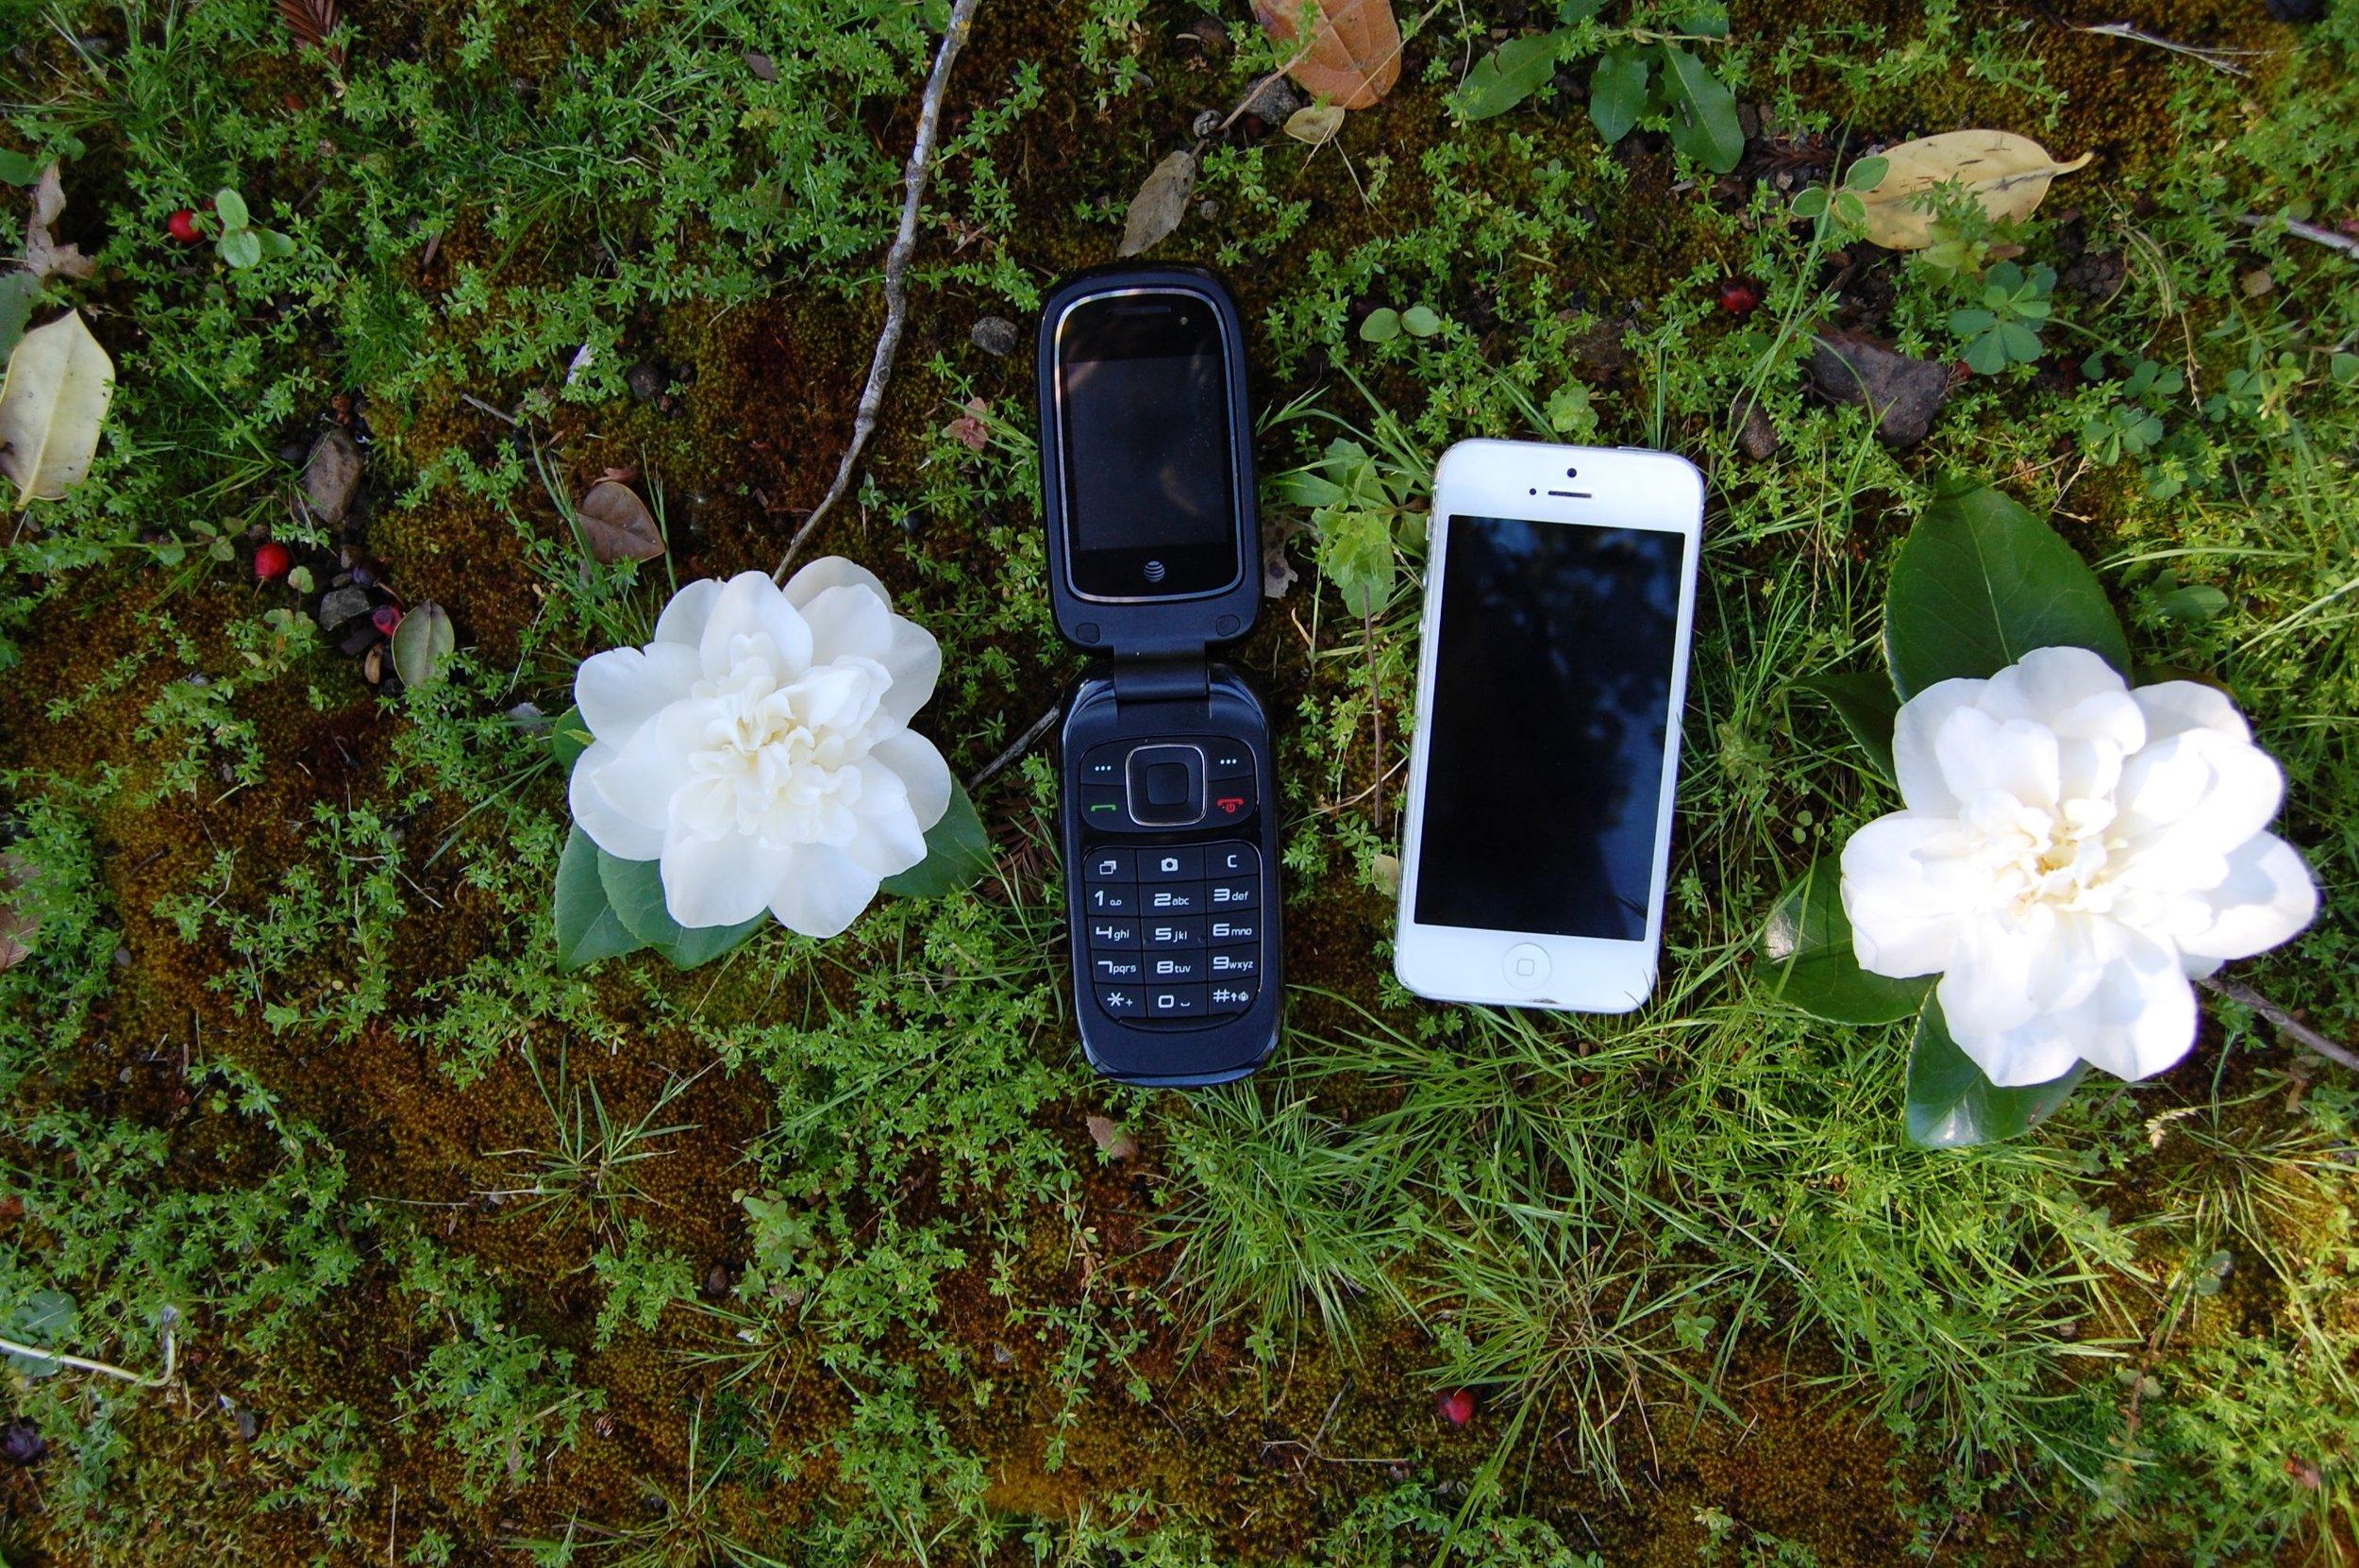 Flip Phone, GoPhone, iPhone 5